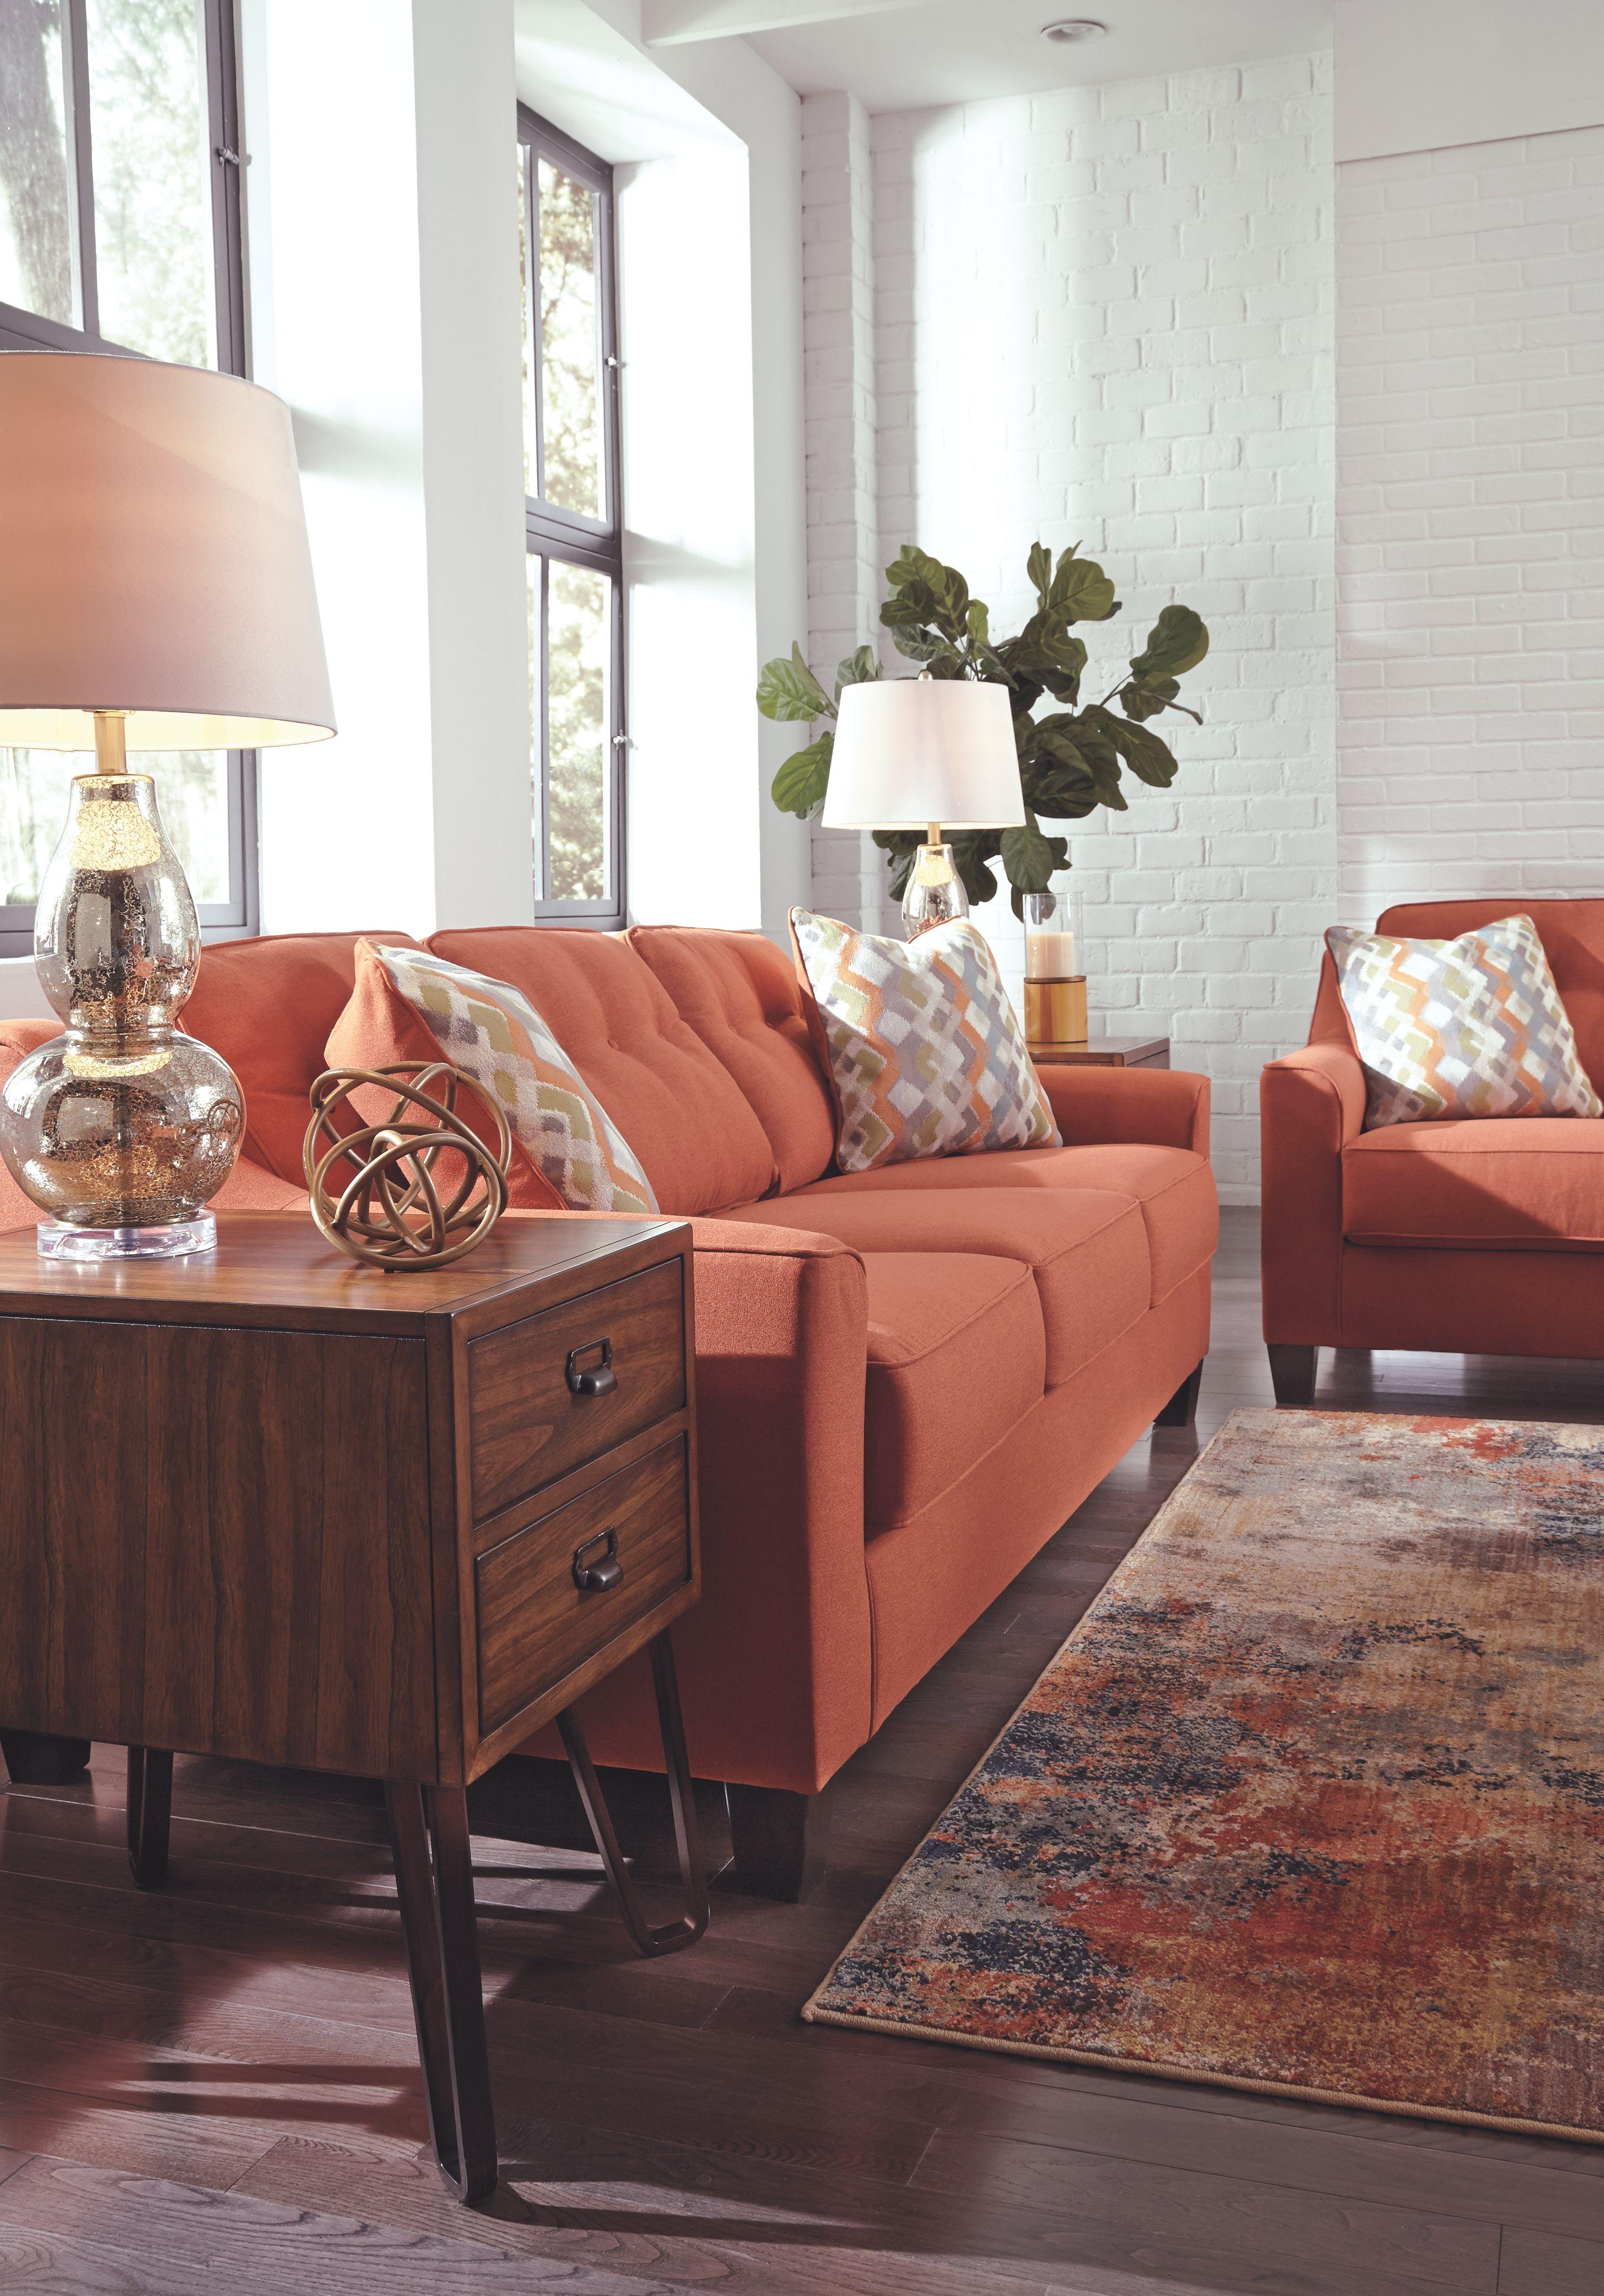 5b5f6d71523507598aaec17f69a8fb11 - Better Homes & Gardens Porter Fabric Tufted Futon Rust Orange